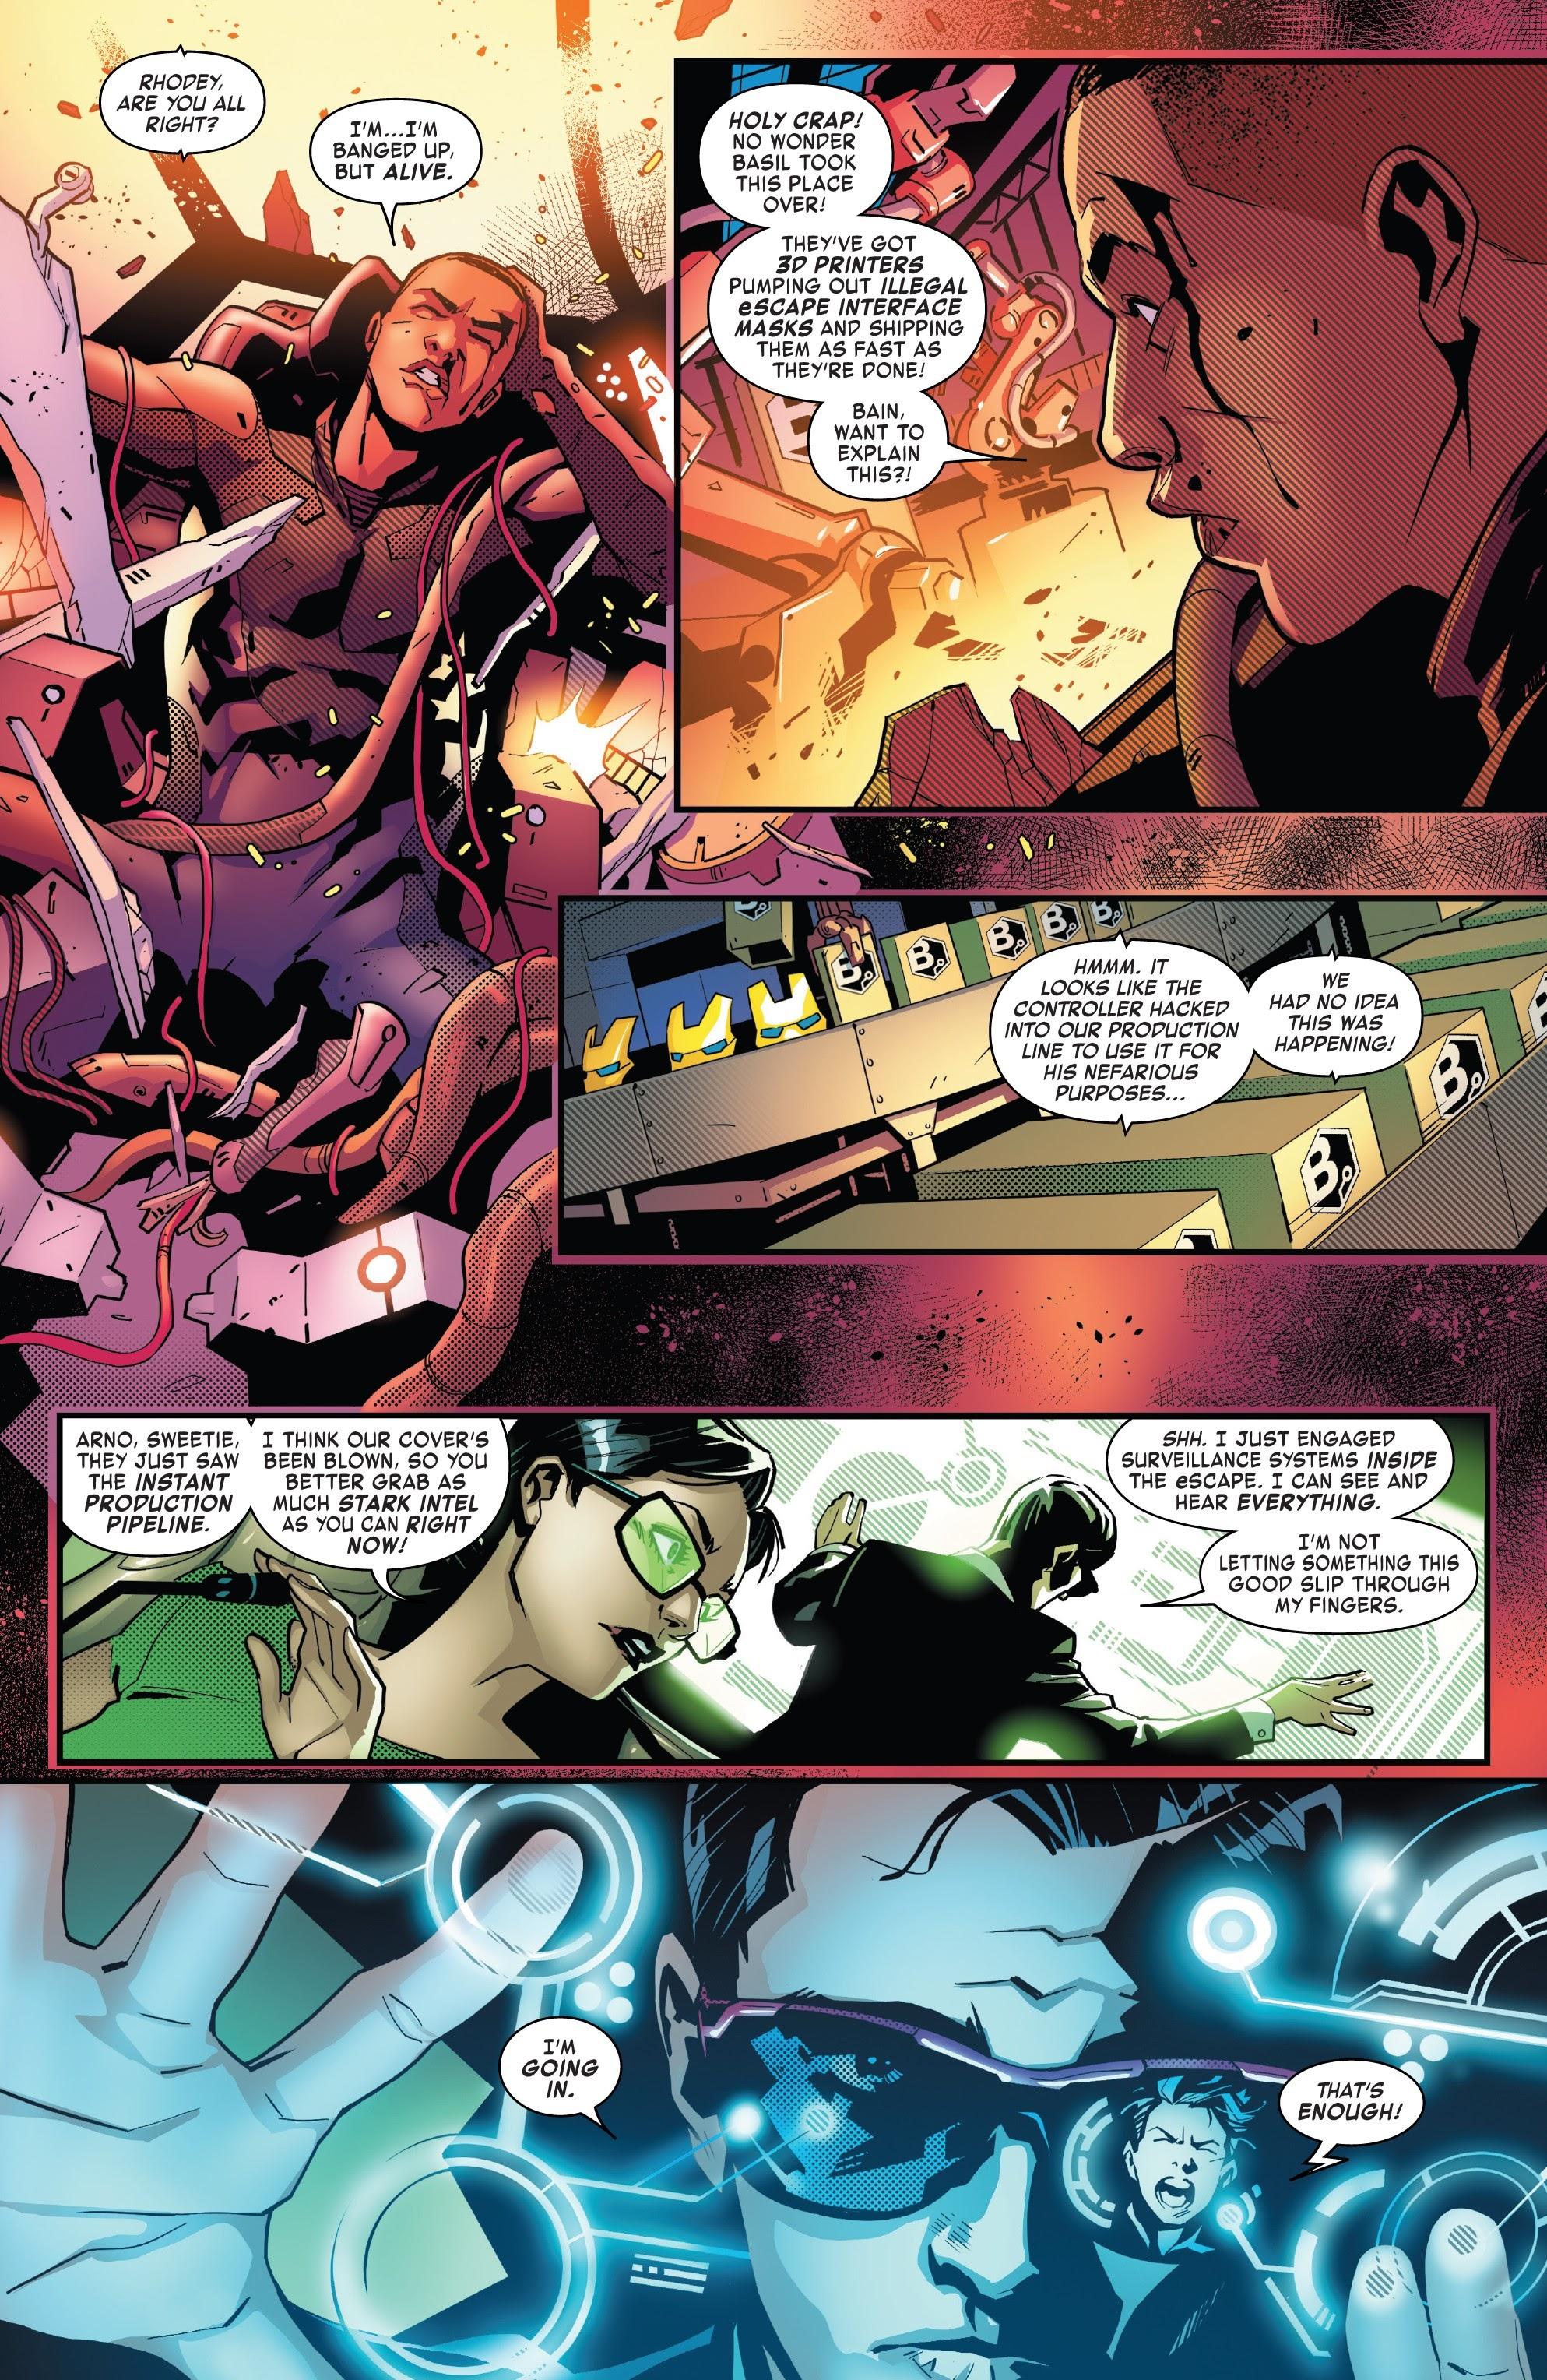 Read online Tony Stark: Iron Man comic -  Issue #10 - 14